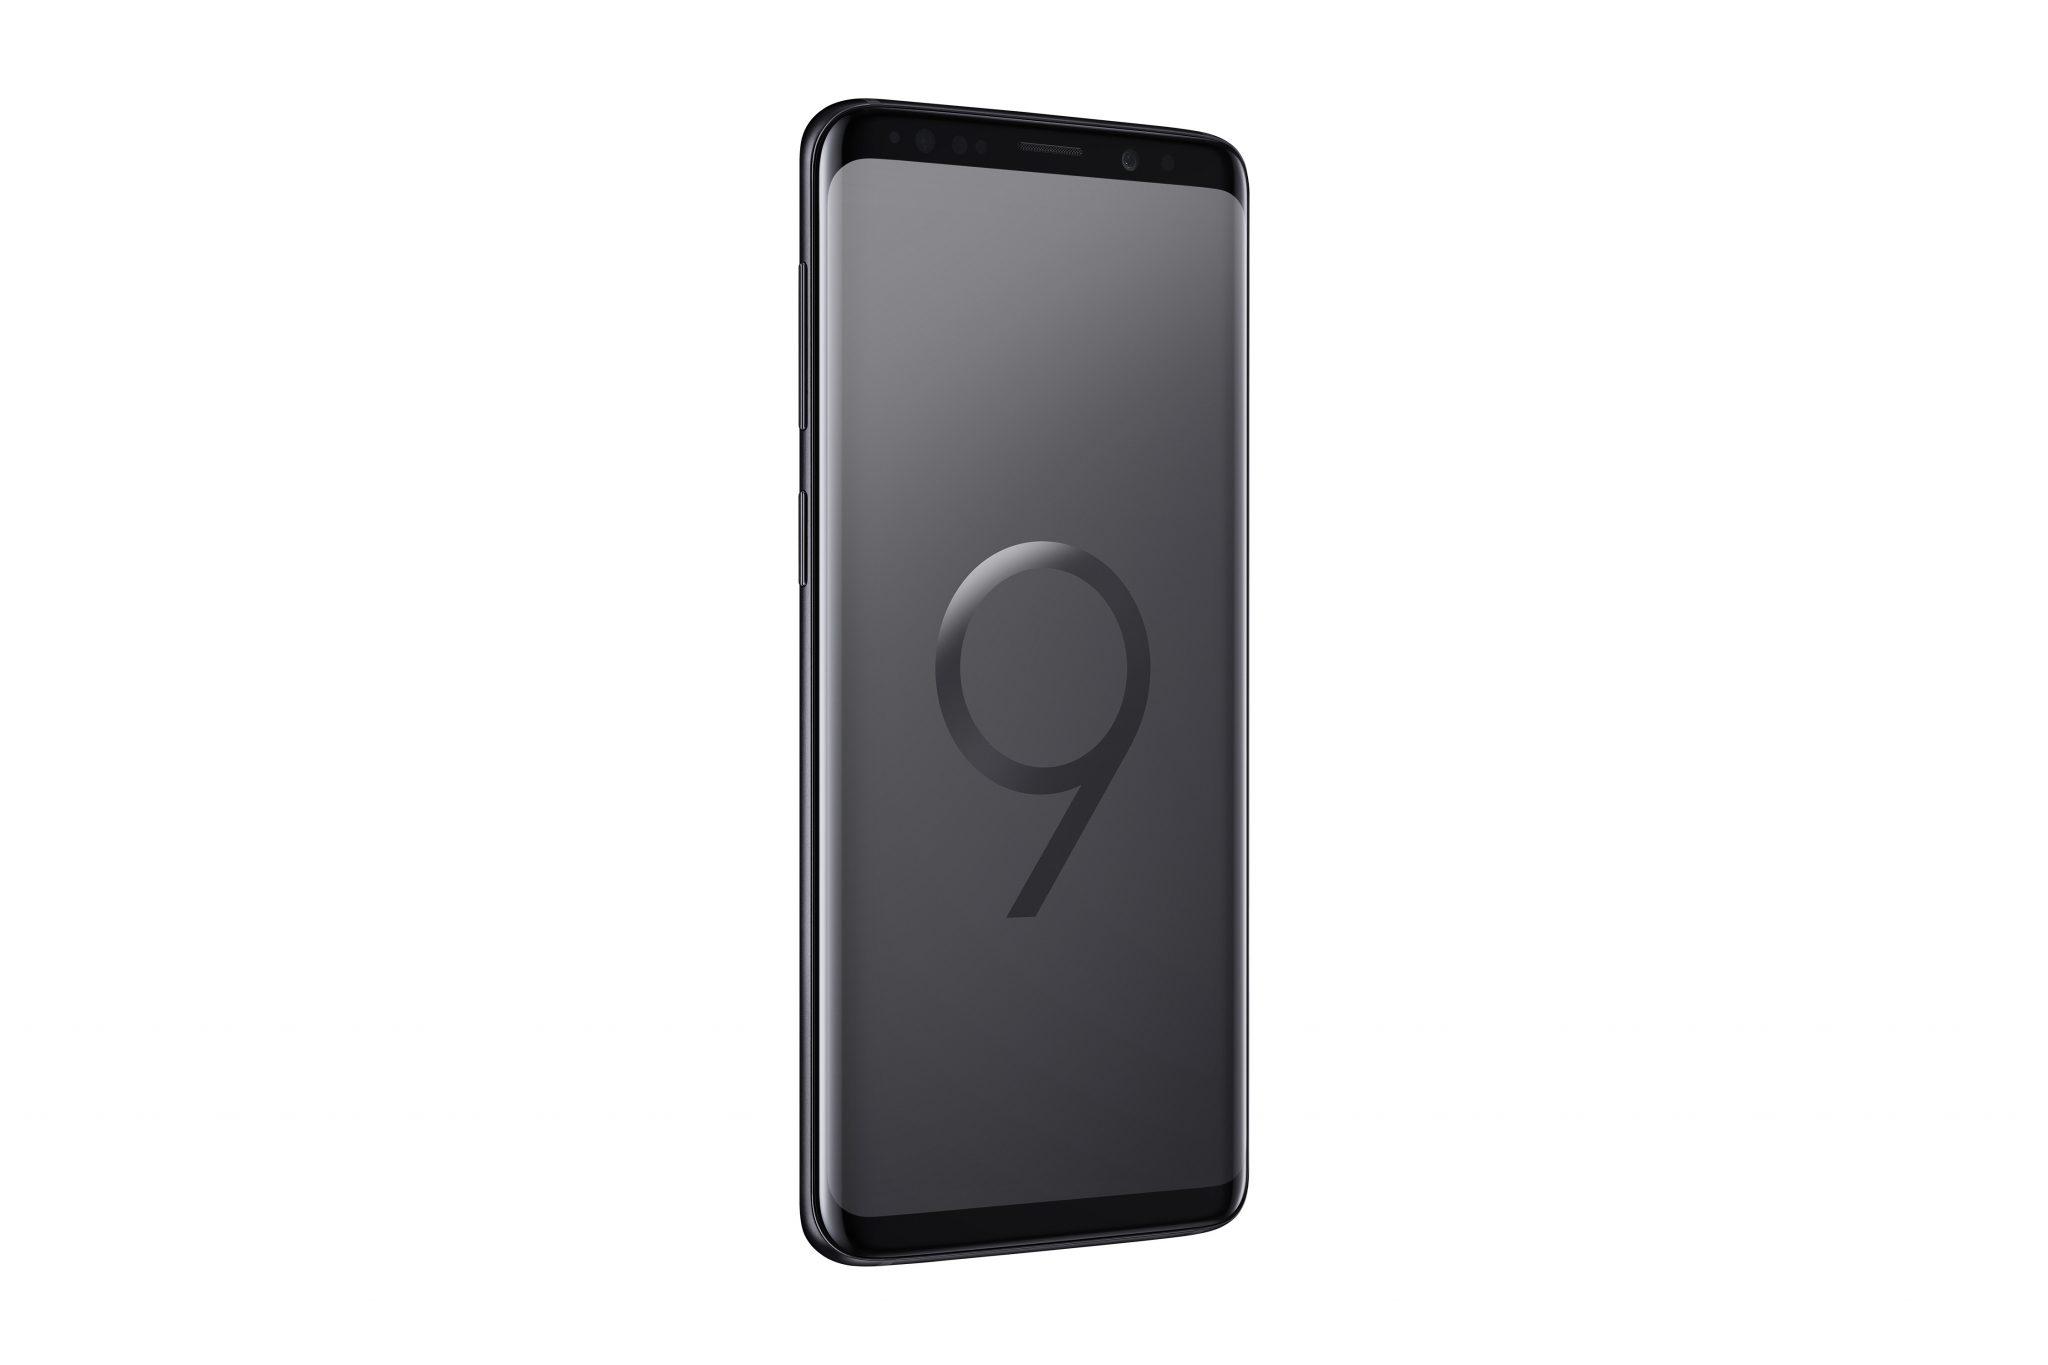 SM G960 GalaxyS9 L30 Black - SM_G960_GalaxyS9_L30_Black